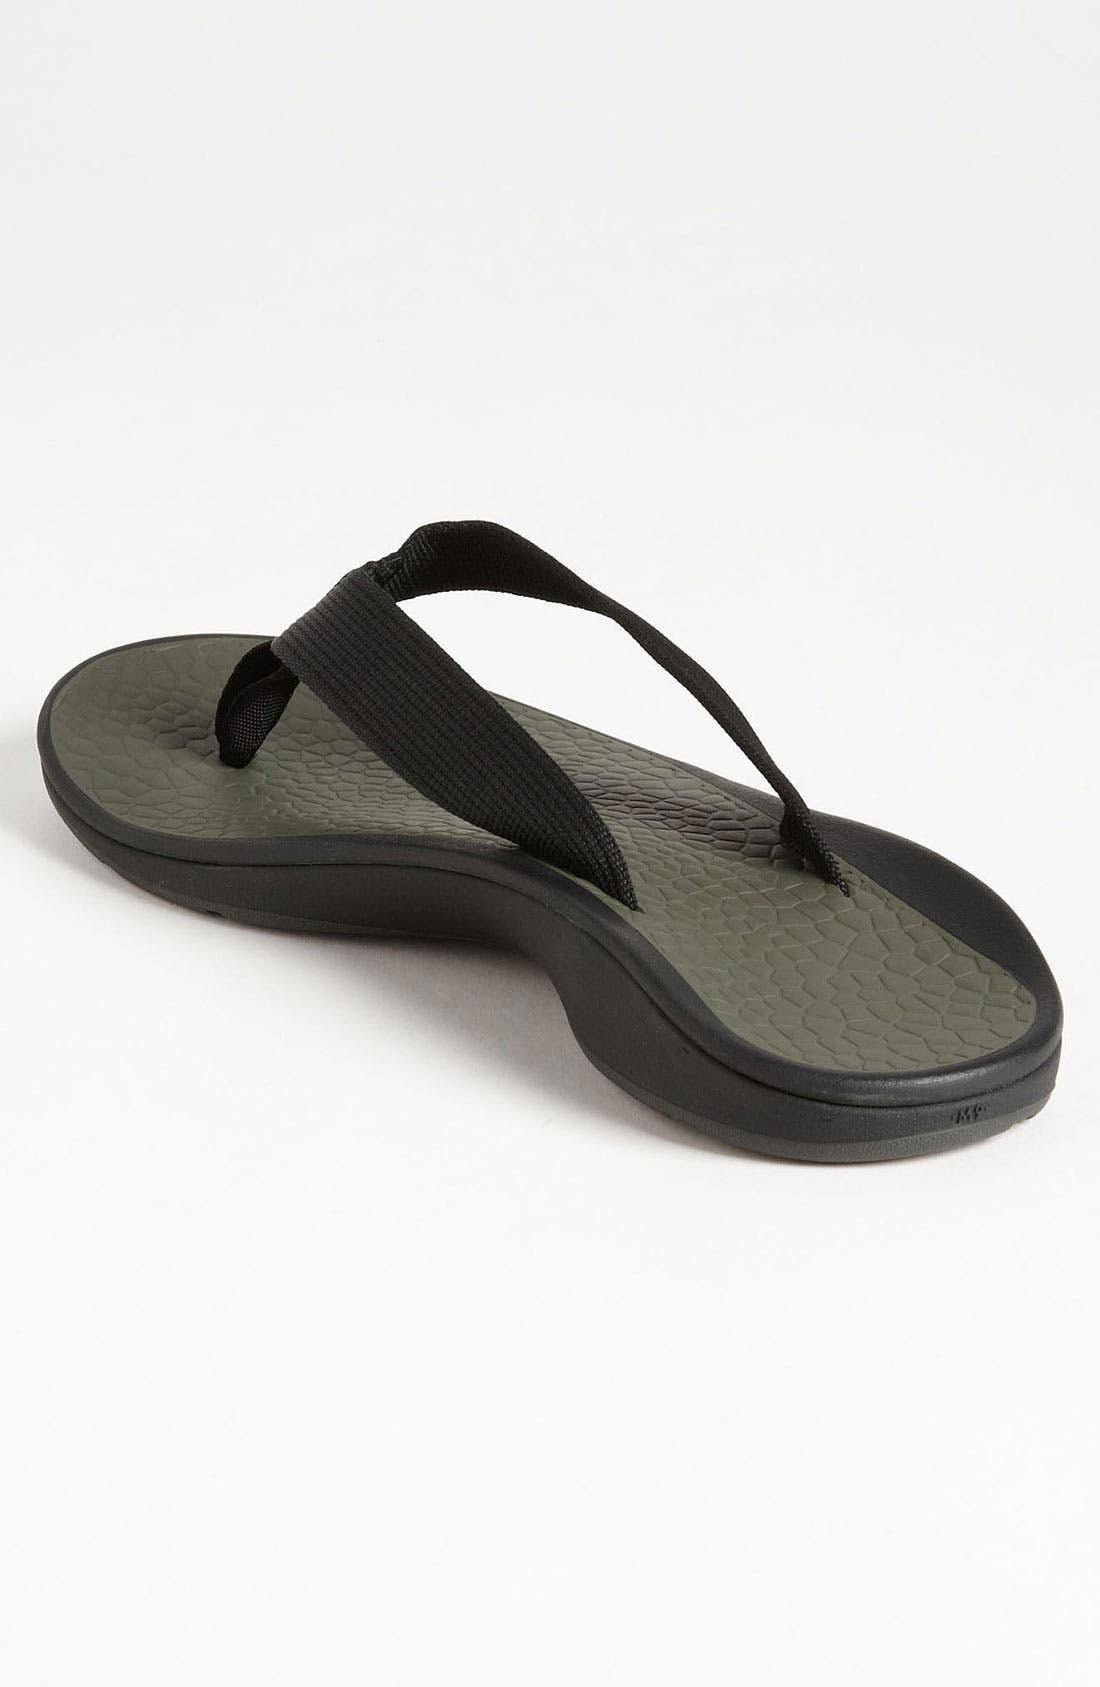 Alternate Image 2  - Chaco 'Fathom' Flip Flop (Men)